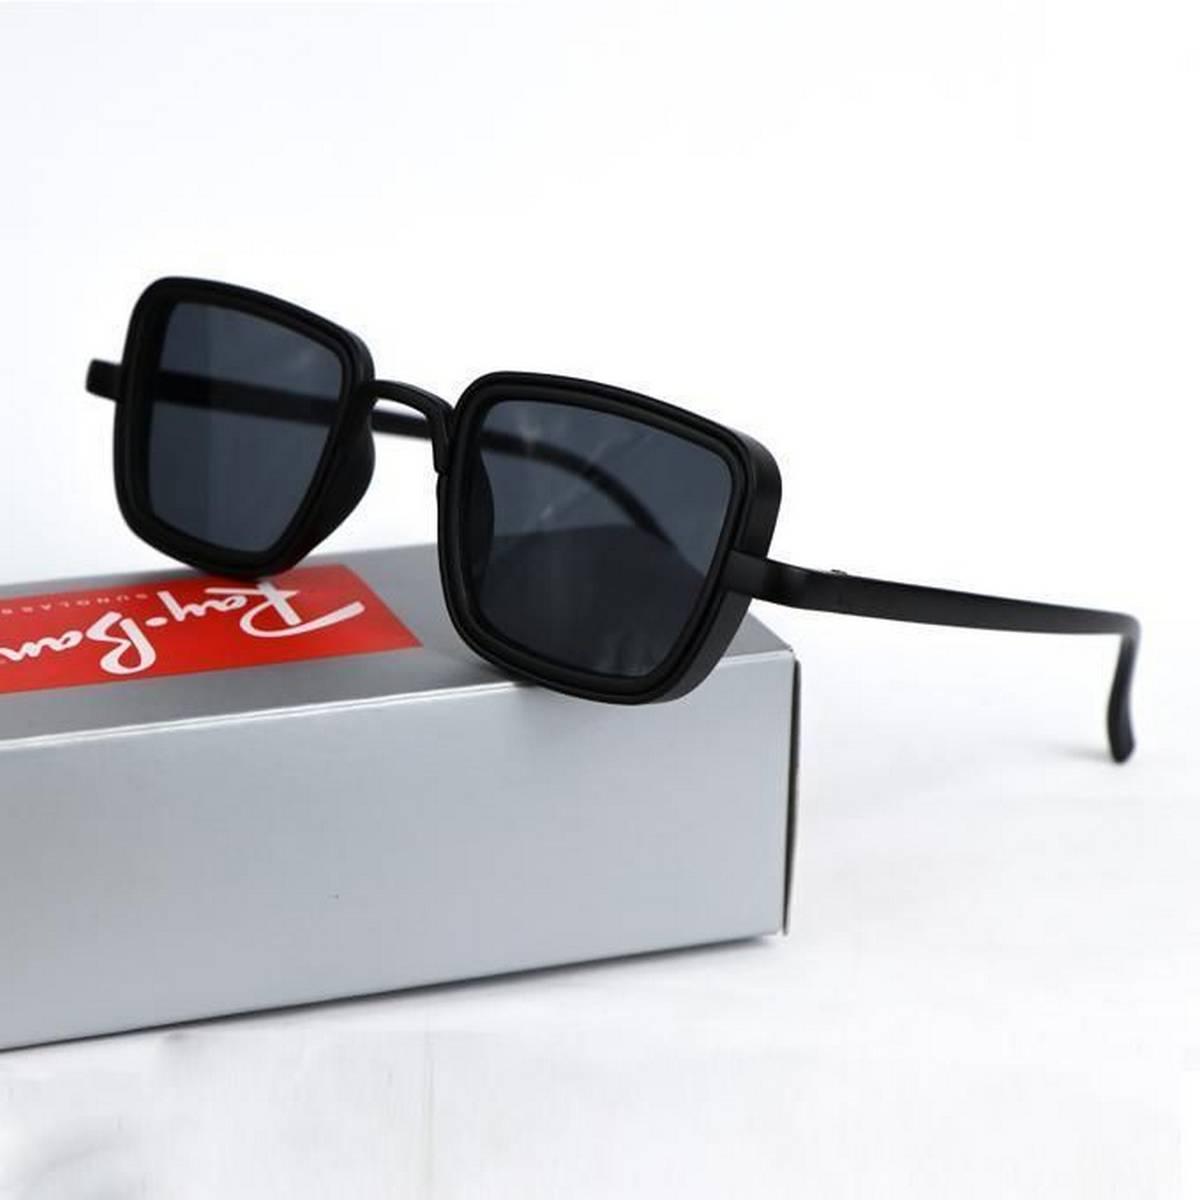 Kabir Singh India Movie Sunglasses For Men Square Retro Sun Shades Steampunk Style Black Metal Frame Sun Glasses for Men and women